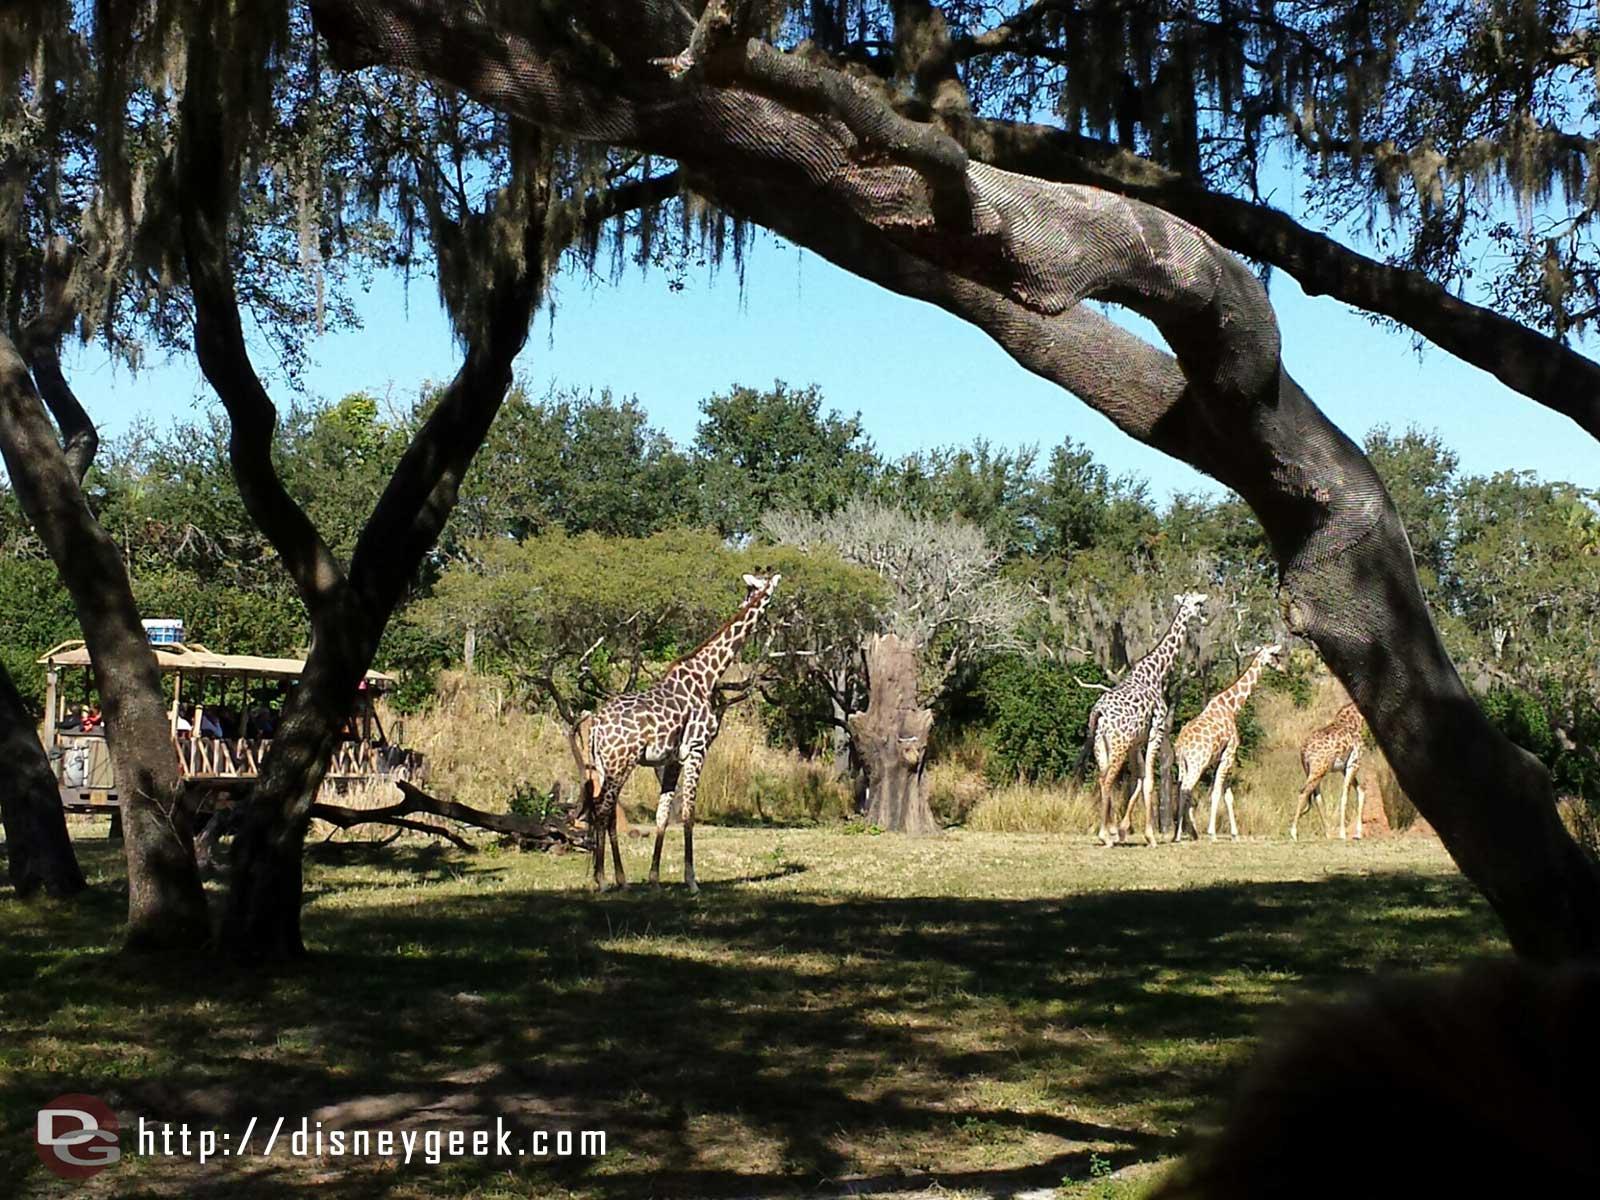 Giraffe on the Kilimanjaro Safari at Disney's Animal #WDW